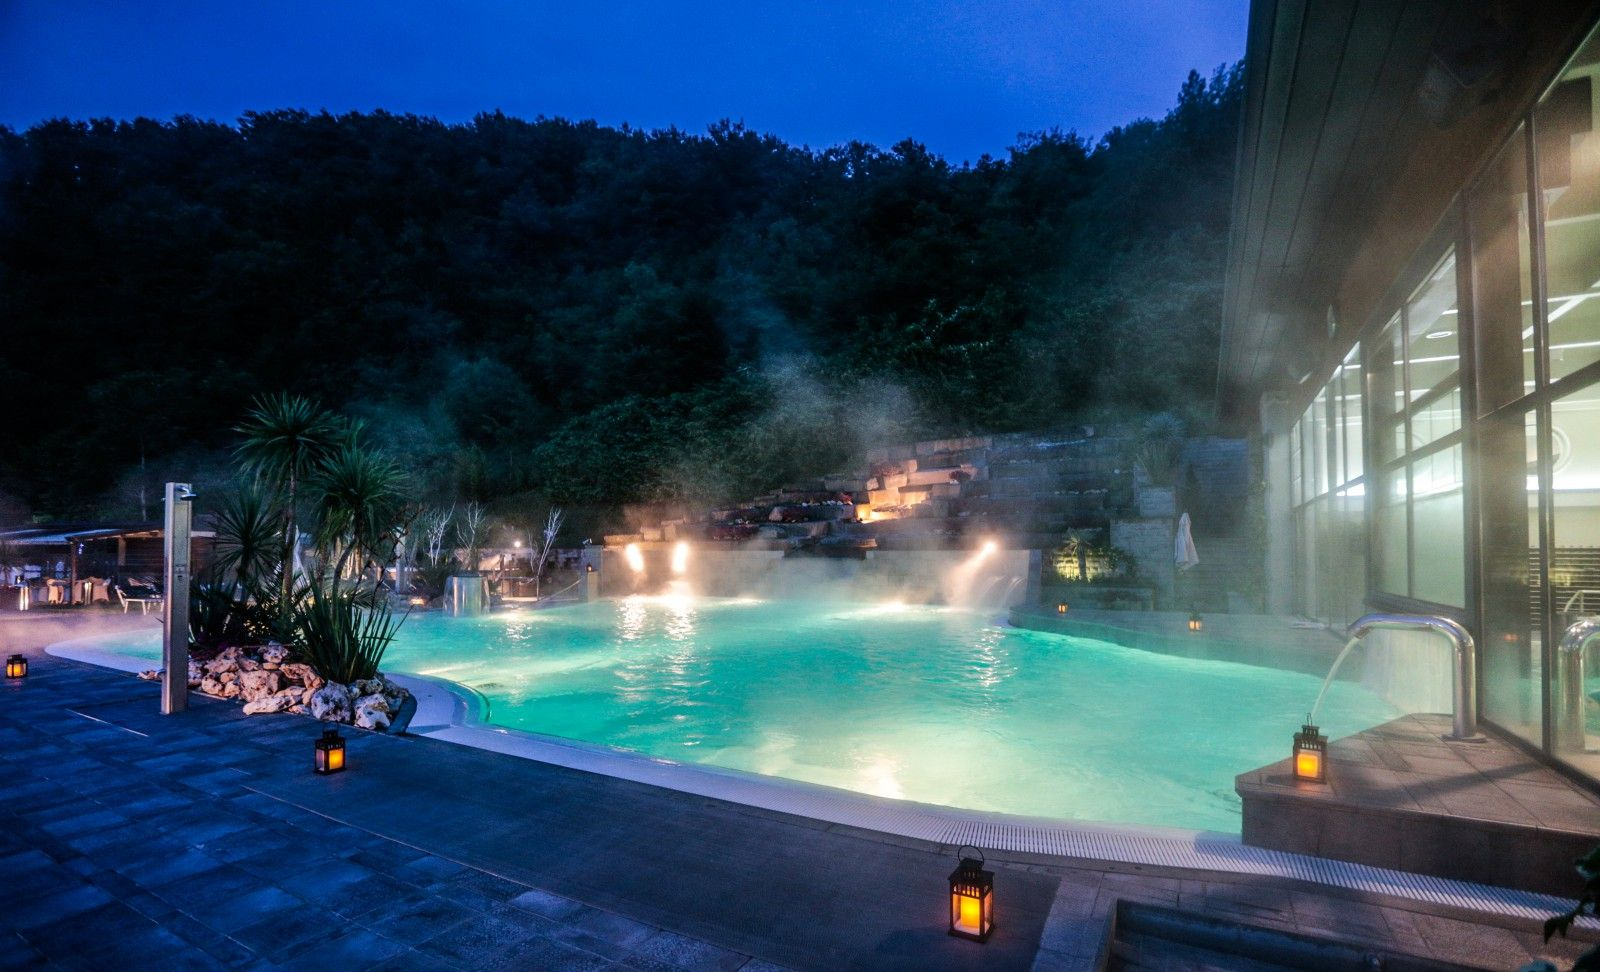 Emejing Hotel Euroterme Bagno Di Romagna Offerte Gallery - New Home ...